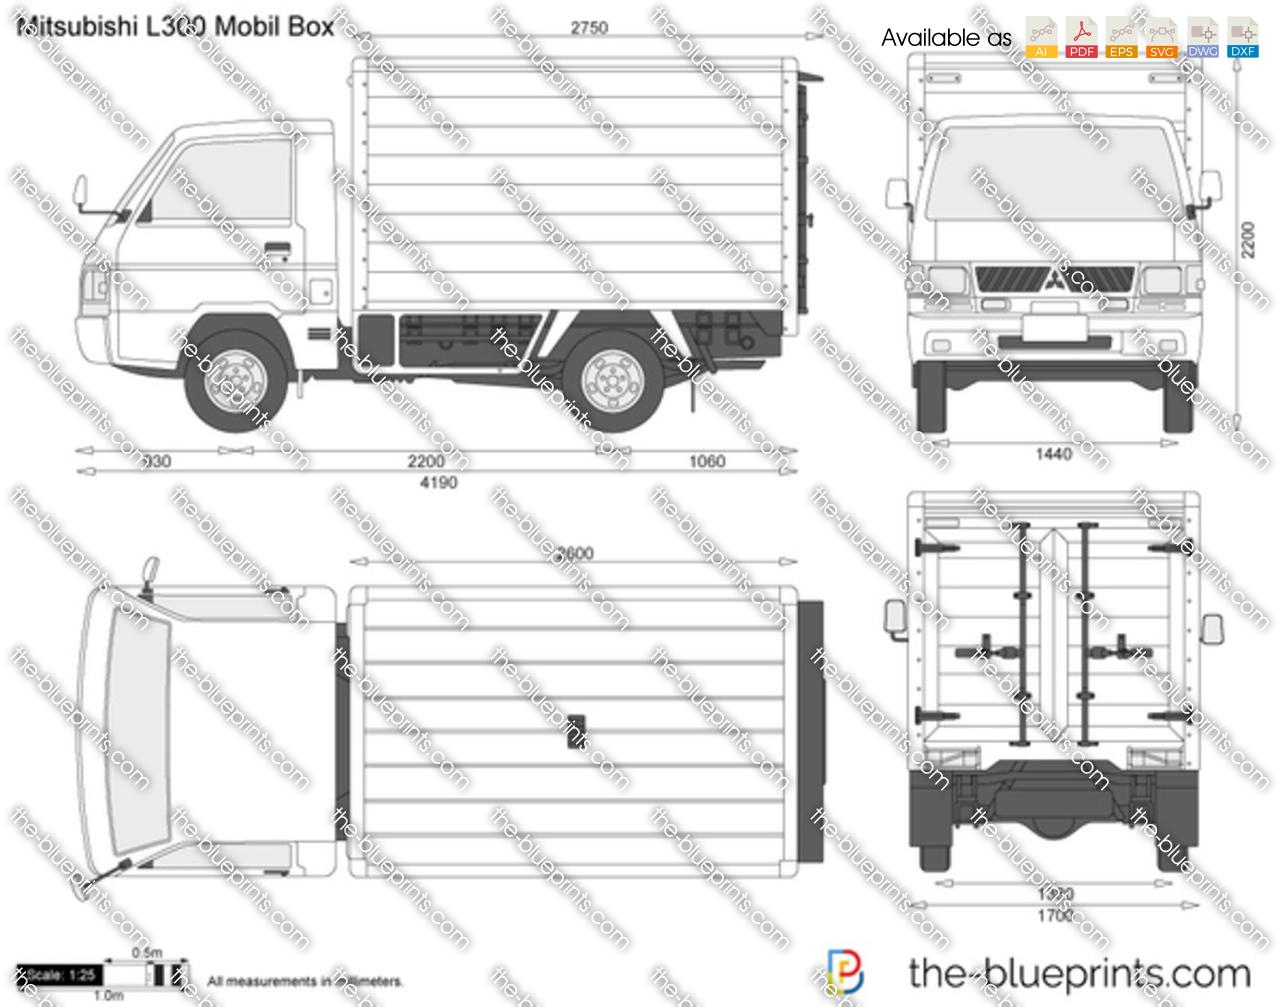 Mitsubishi L300 Mobil Box 1987